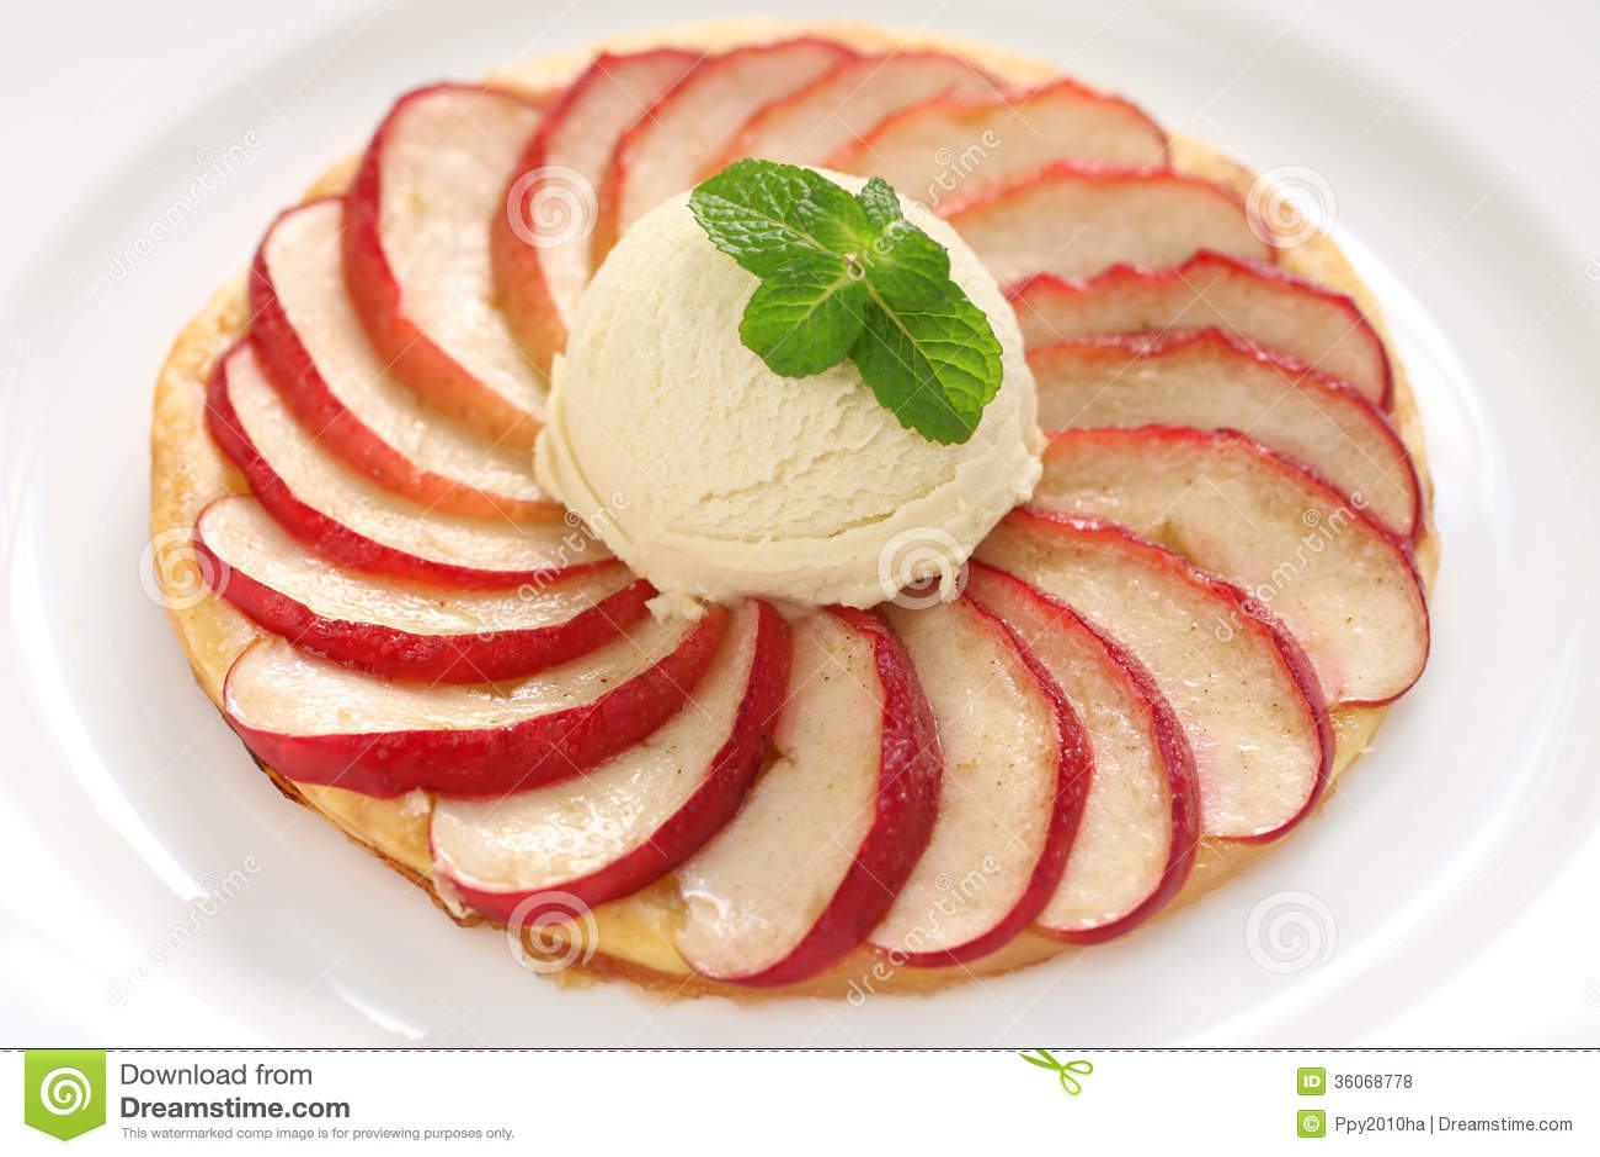 Apple Tart, Flat Apple Pie Royalty Free Stock Photos ...